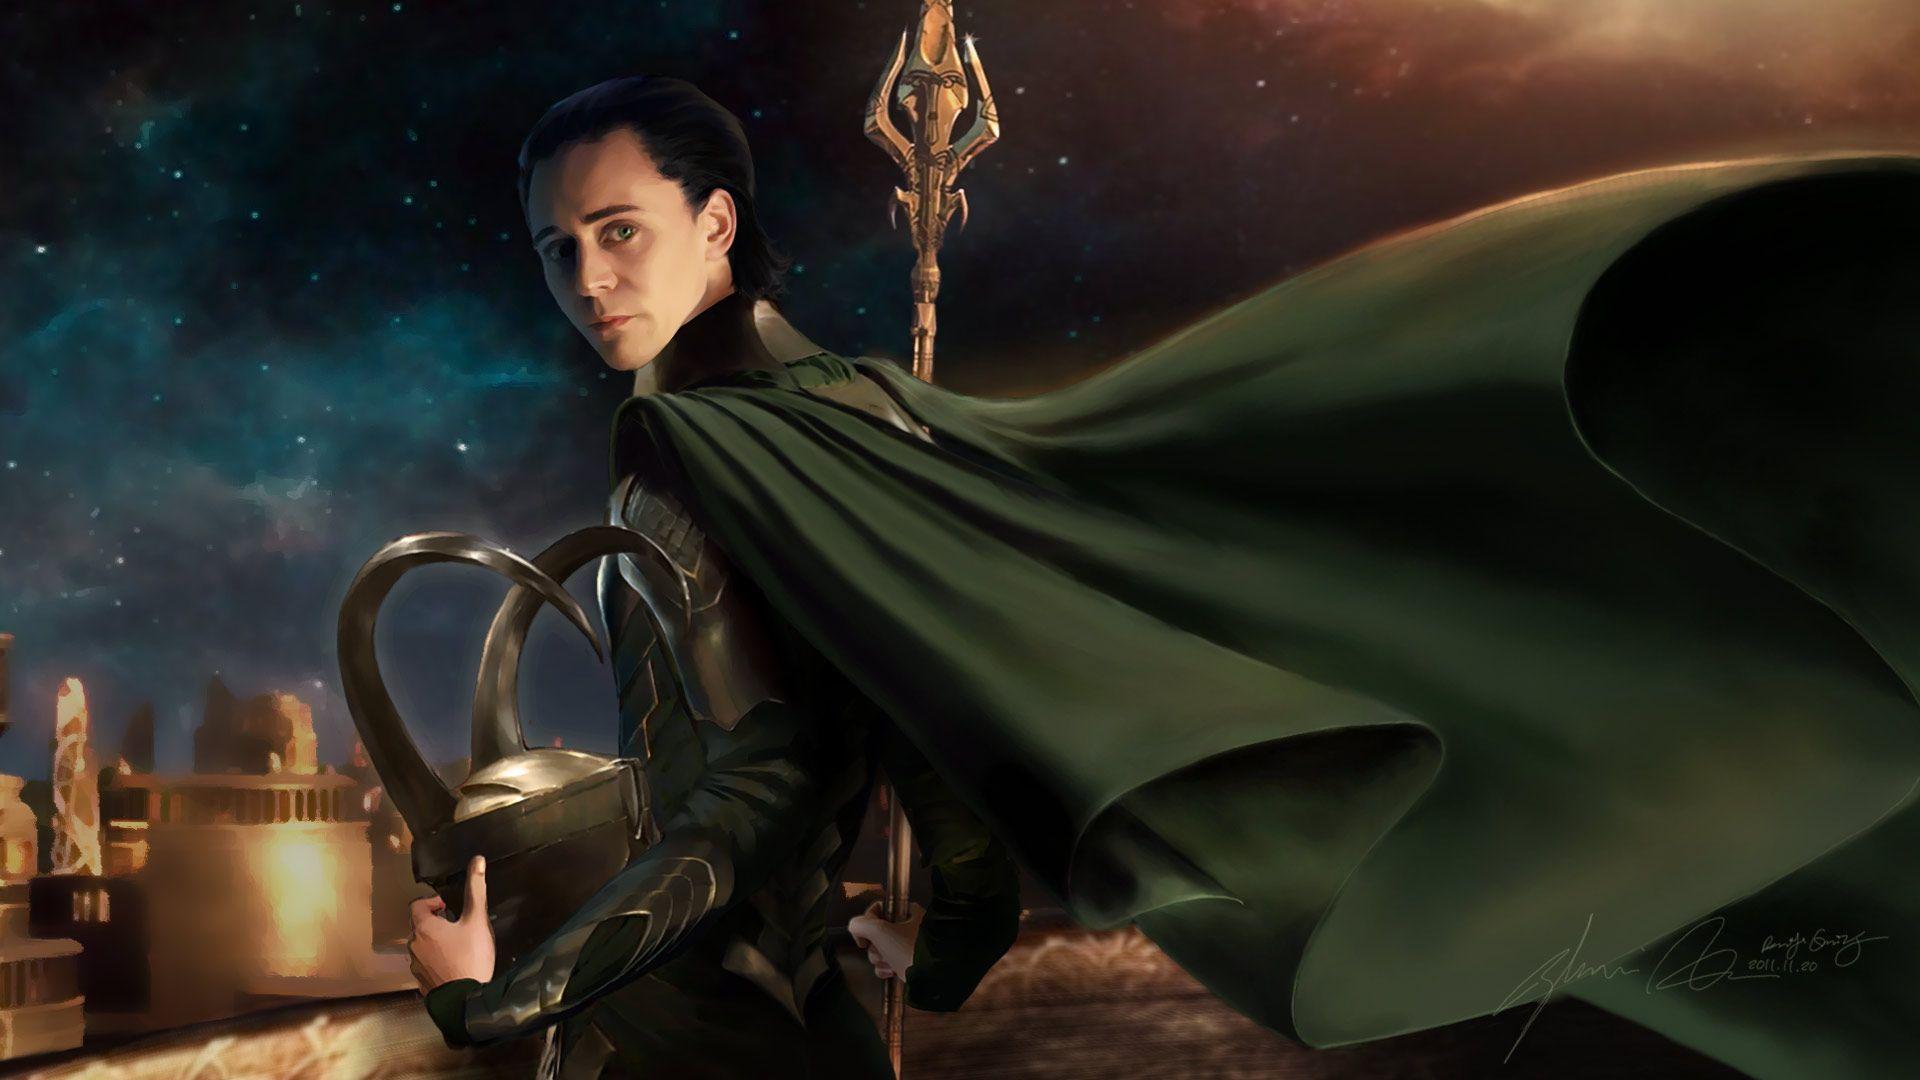 Marvel Wallpaper Loki